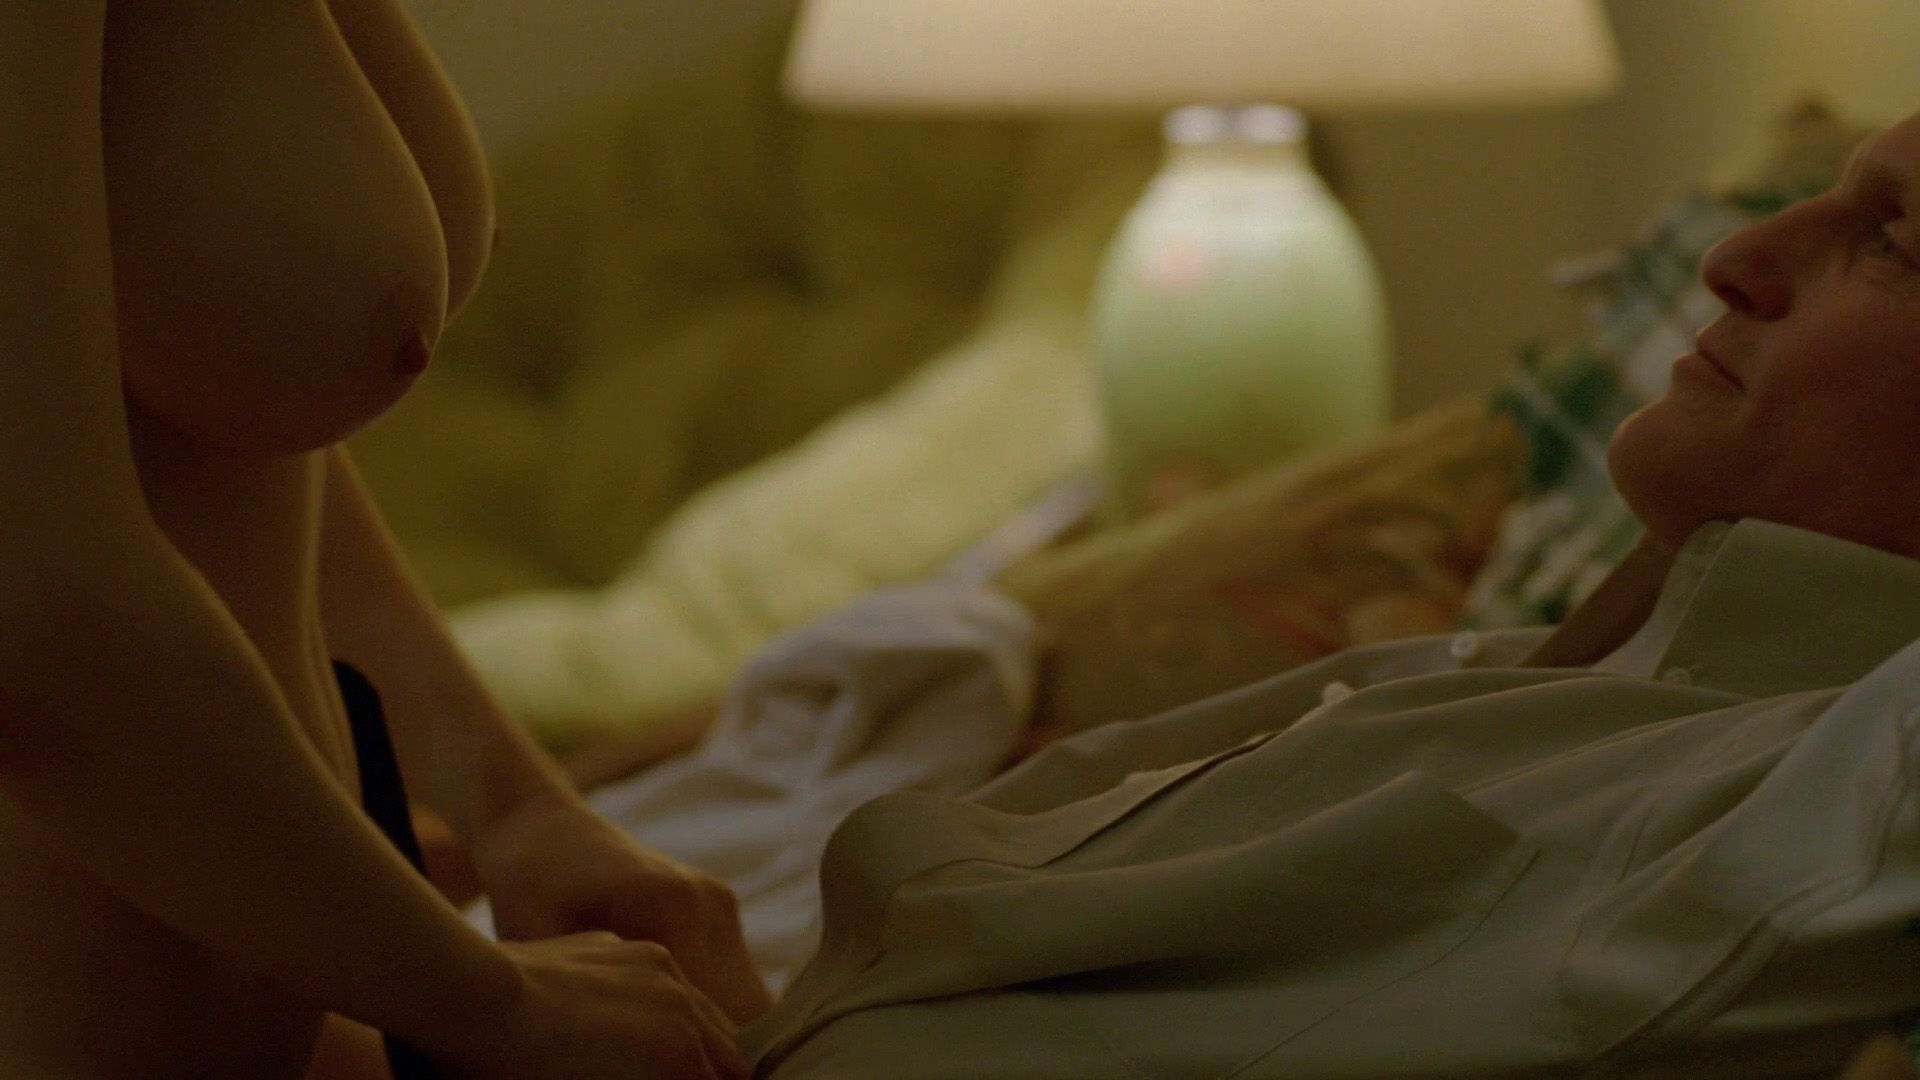 Alexandra-Daddario-Nude_thefappening_one (4)